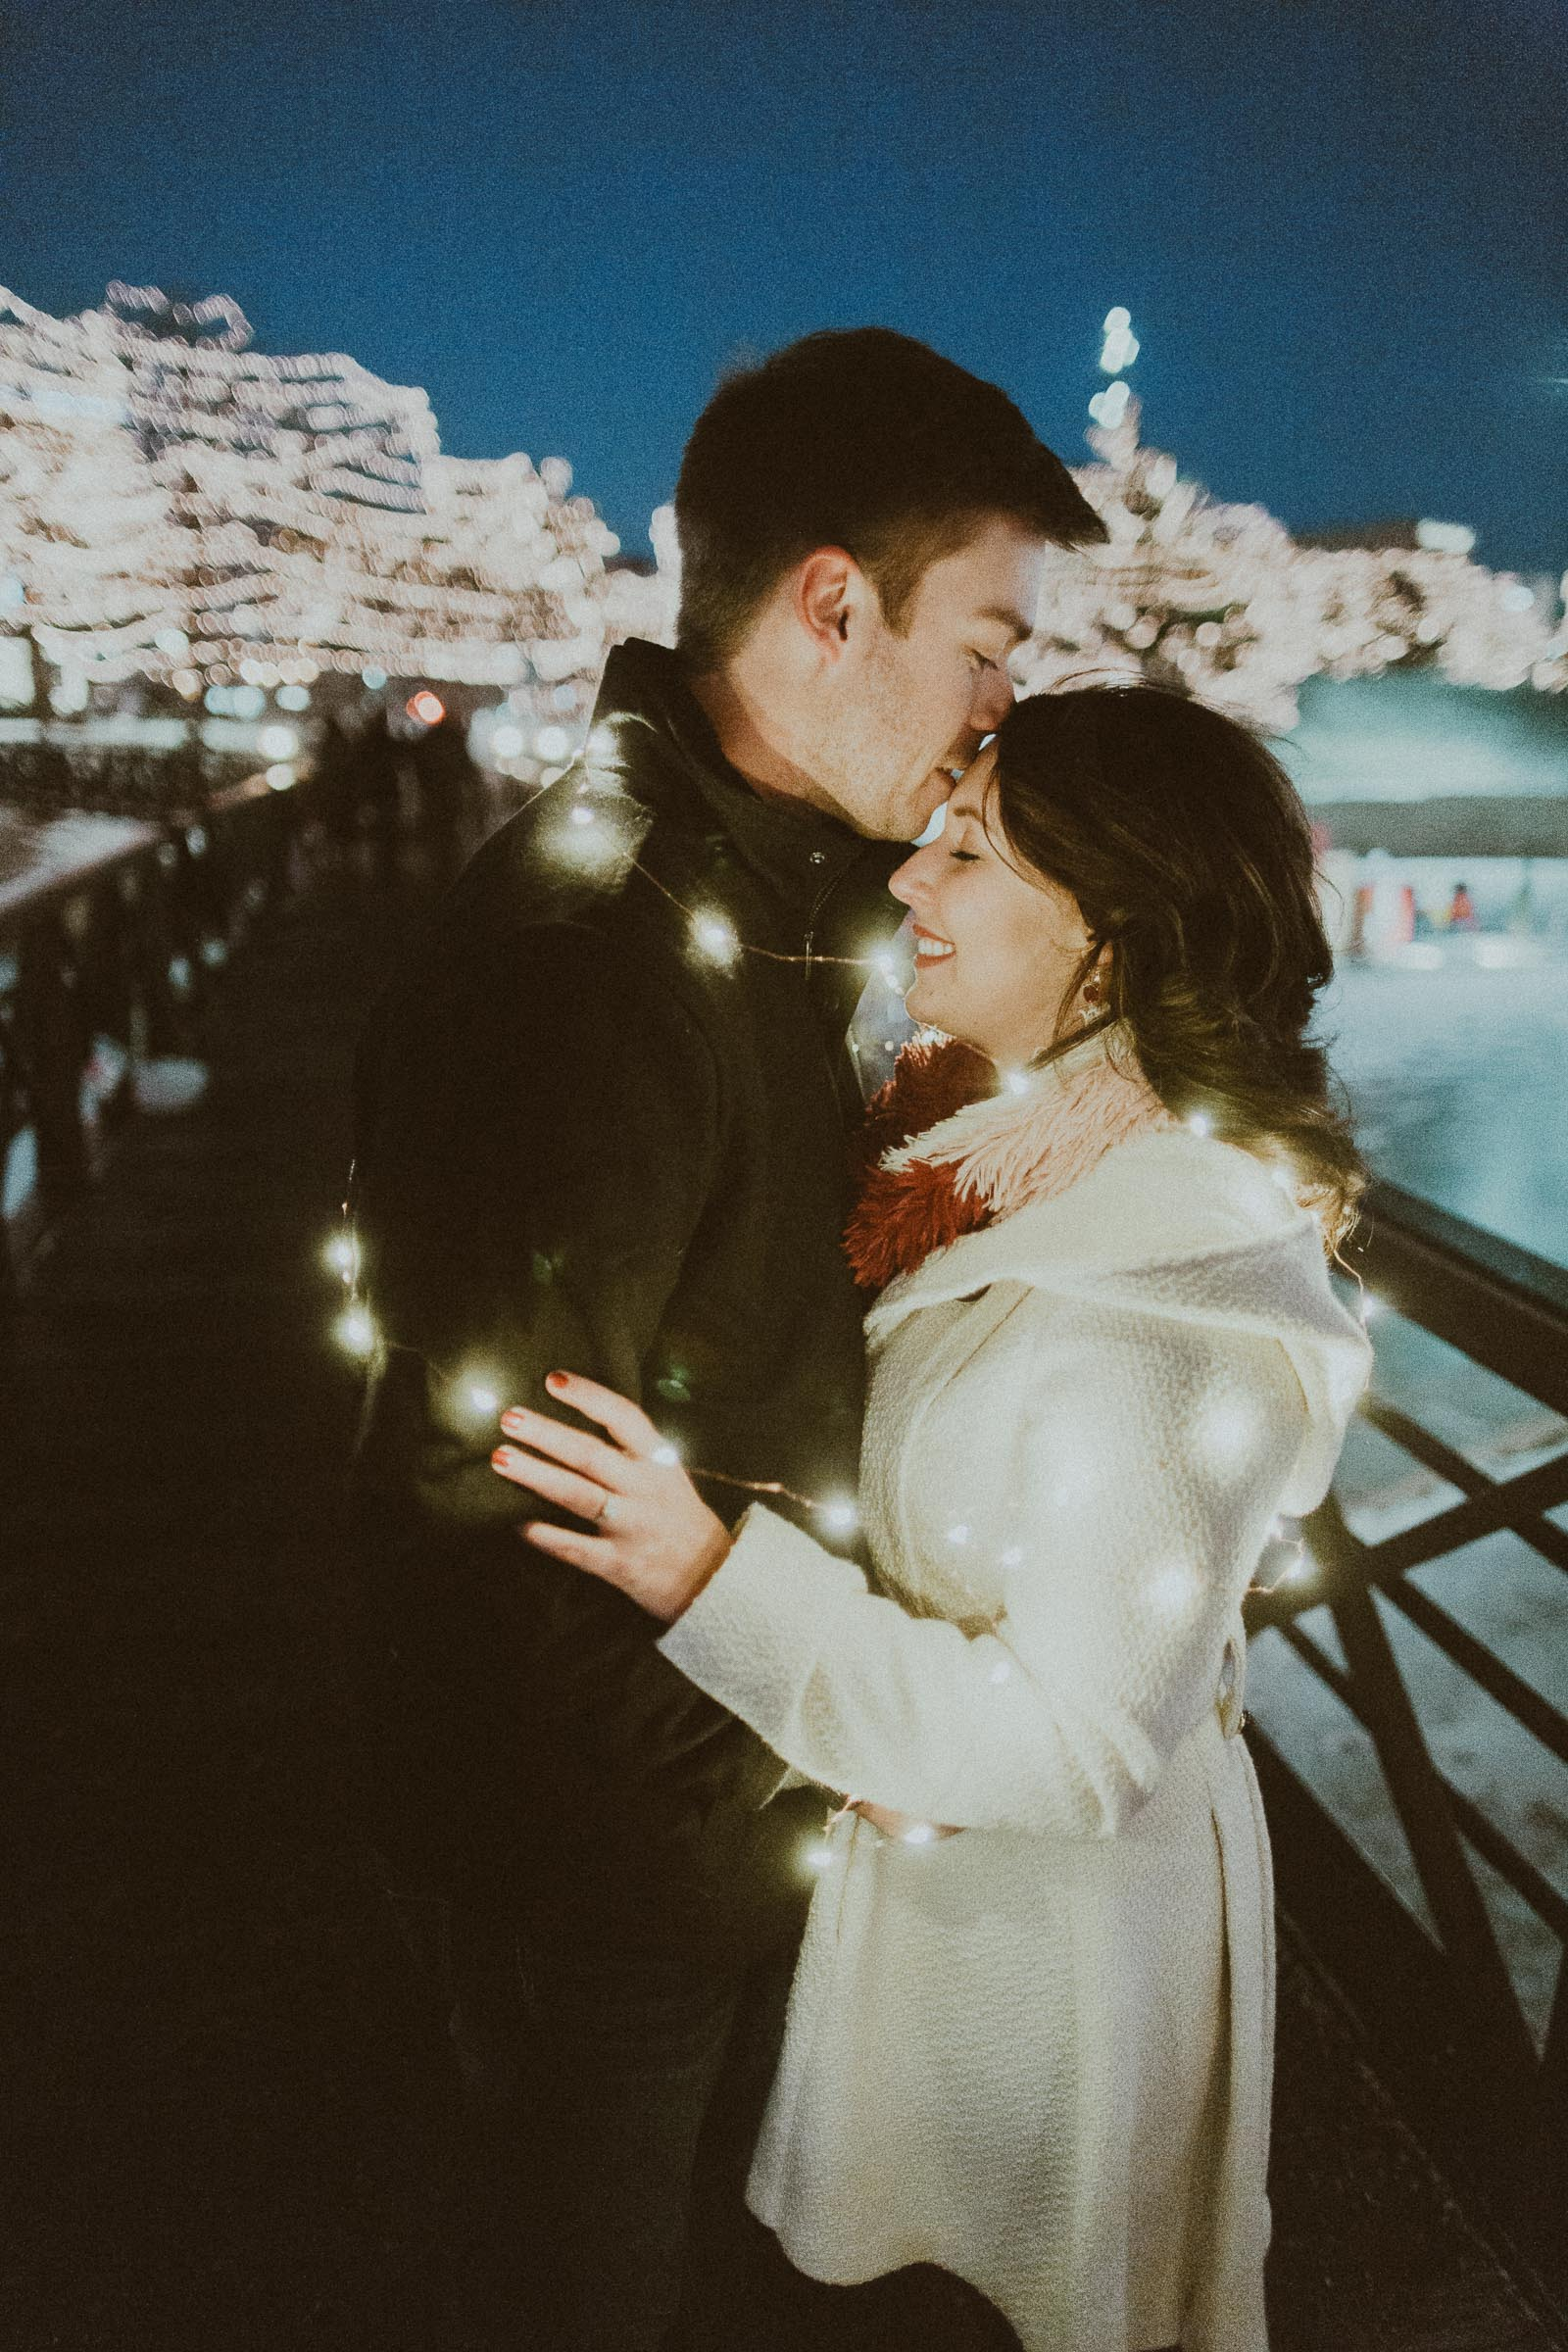 Justin + Breahn  Christmas Lights Omaha, Nebraska Engagement Session   VIEW